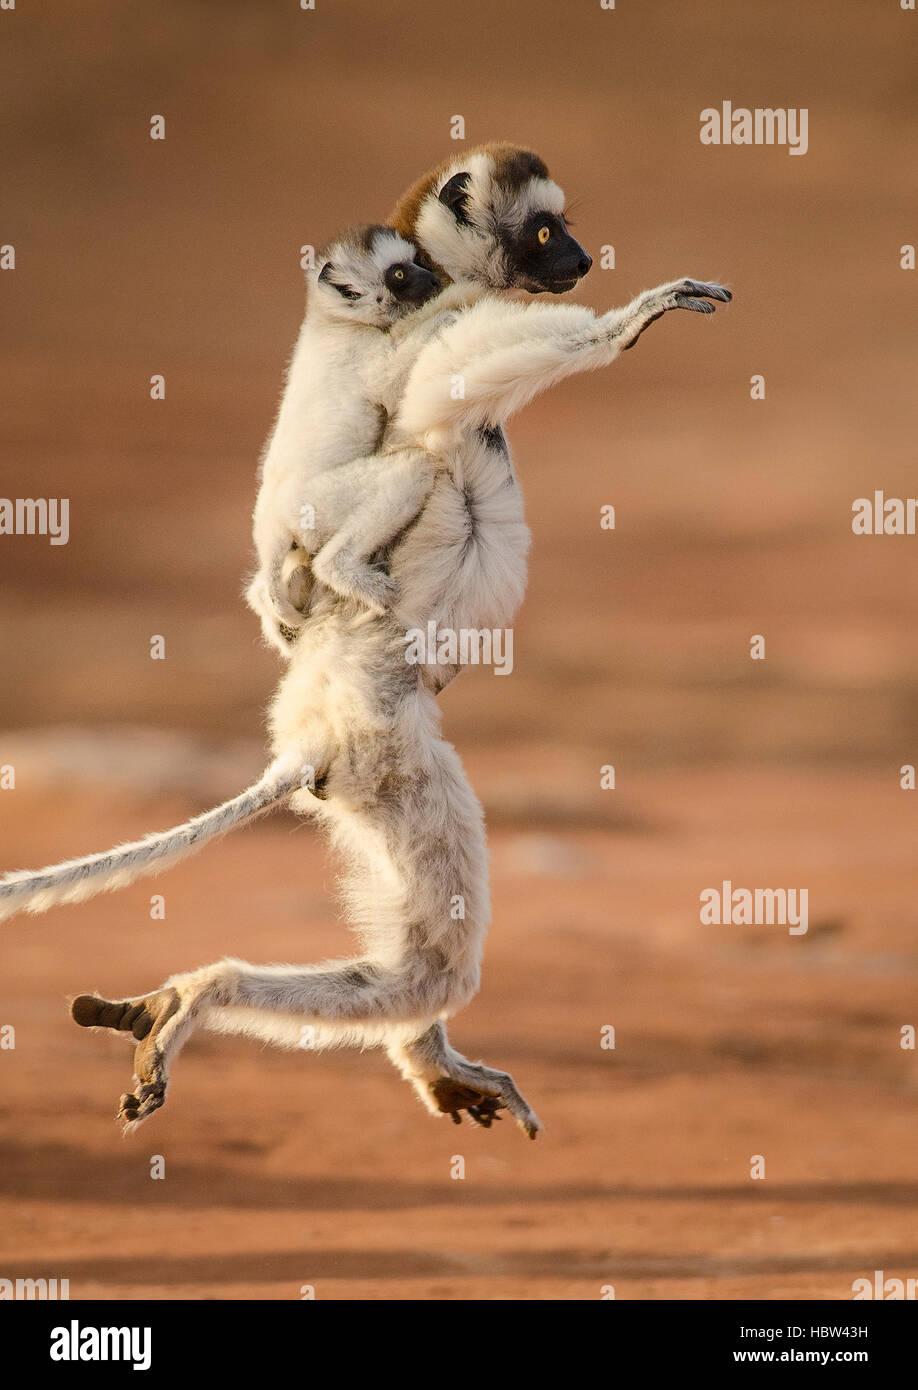 Verreaux's Dancing Sifaka (Propithecus verreauxi) mother and baby - Stock Image